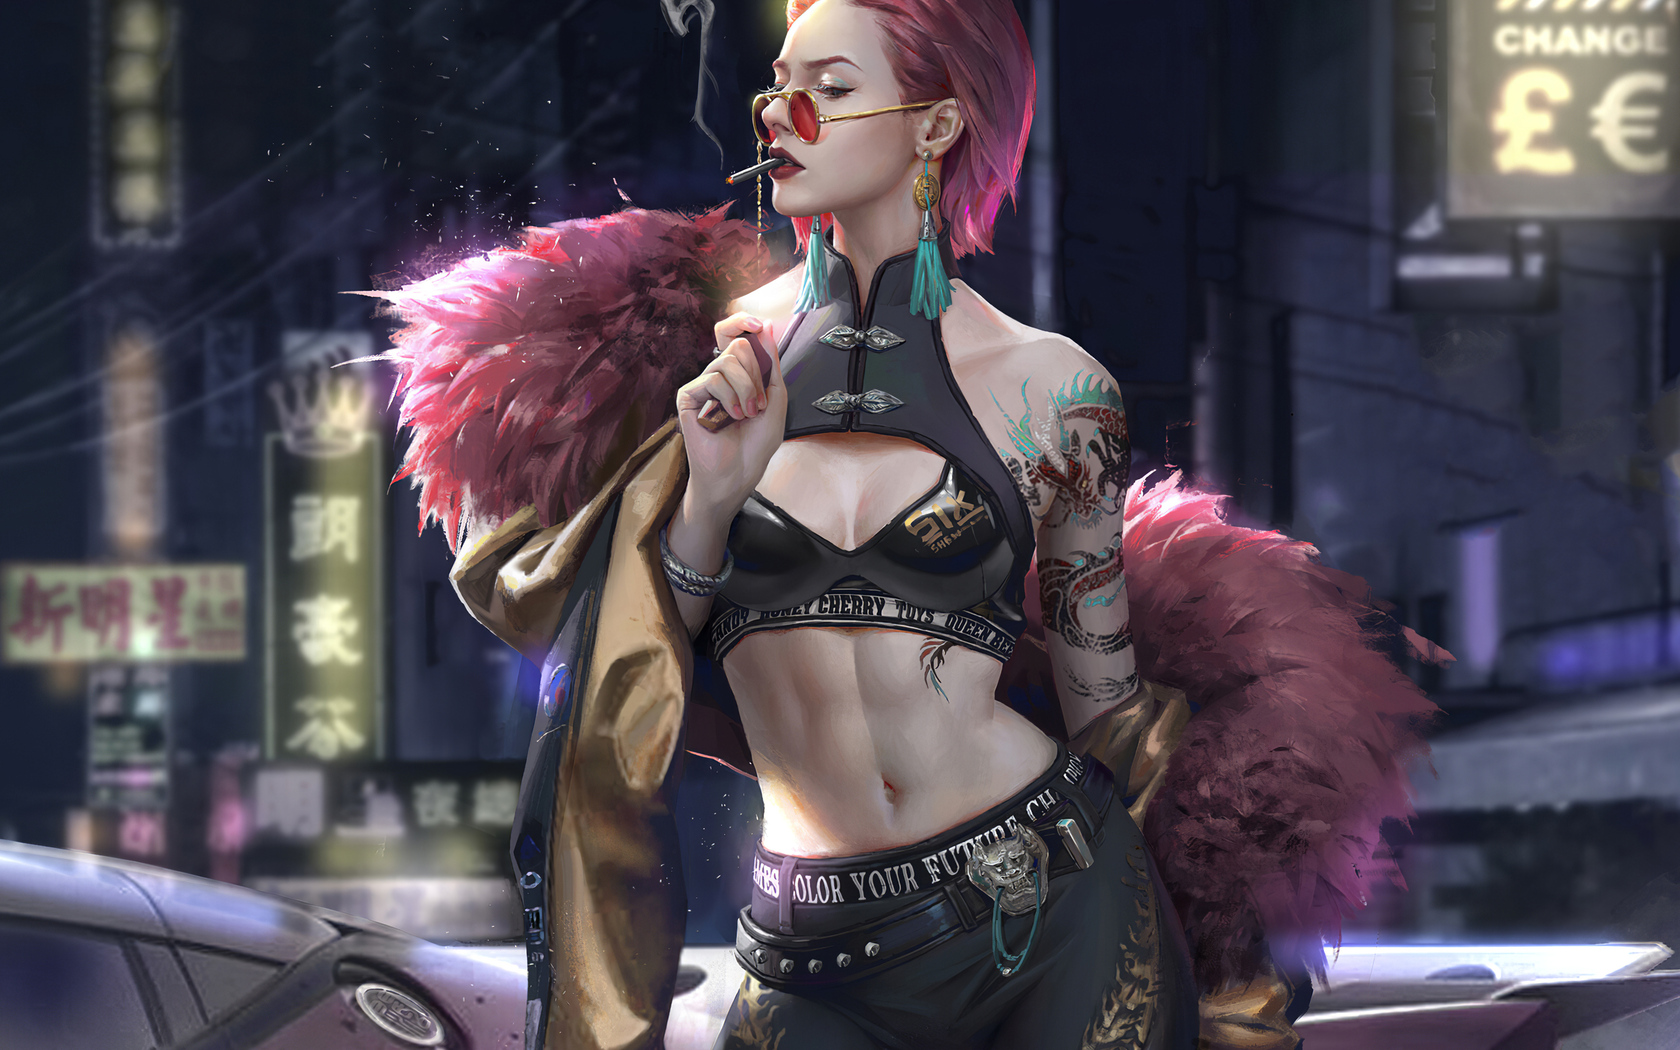 kuo-cyberpunk-girl-3y.jpg